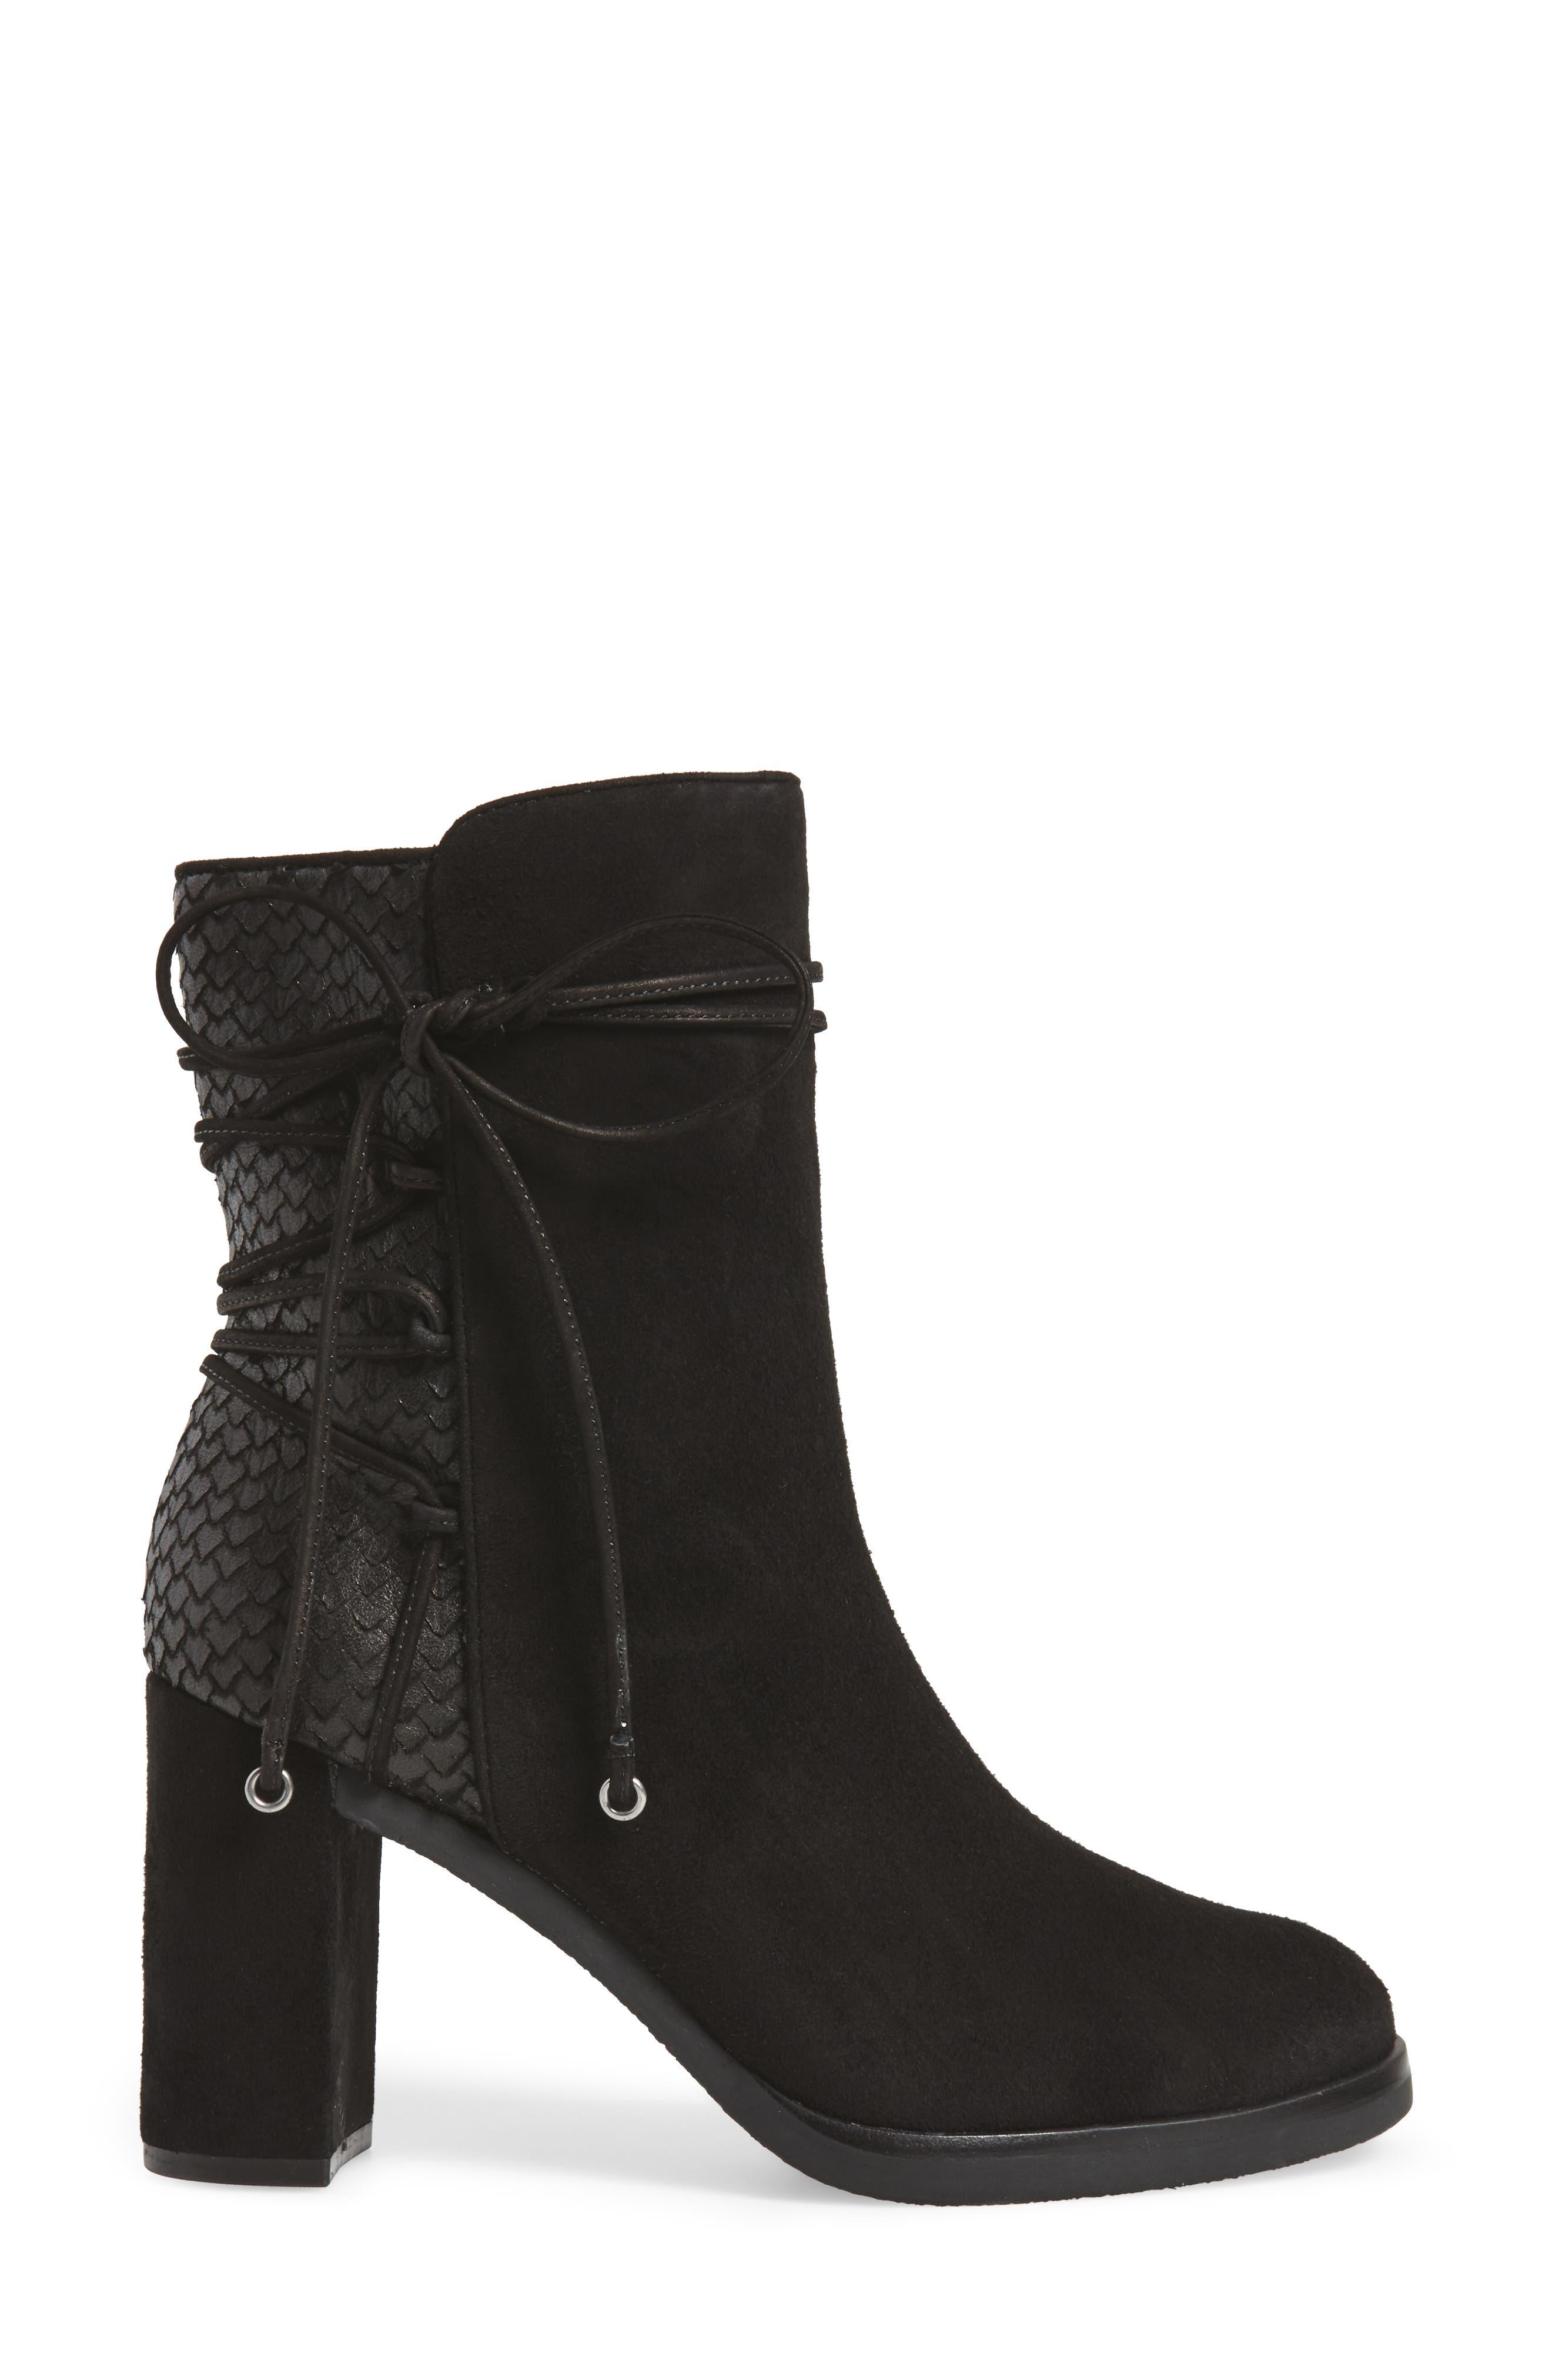 Adley Ankle Wrap Boot,                             Alternate thumbnail 3, color,                             Black Suede